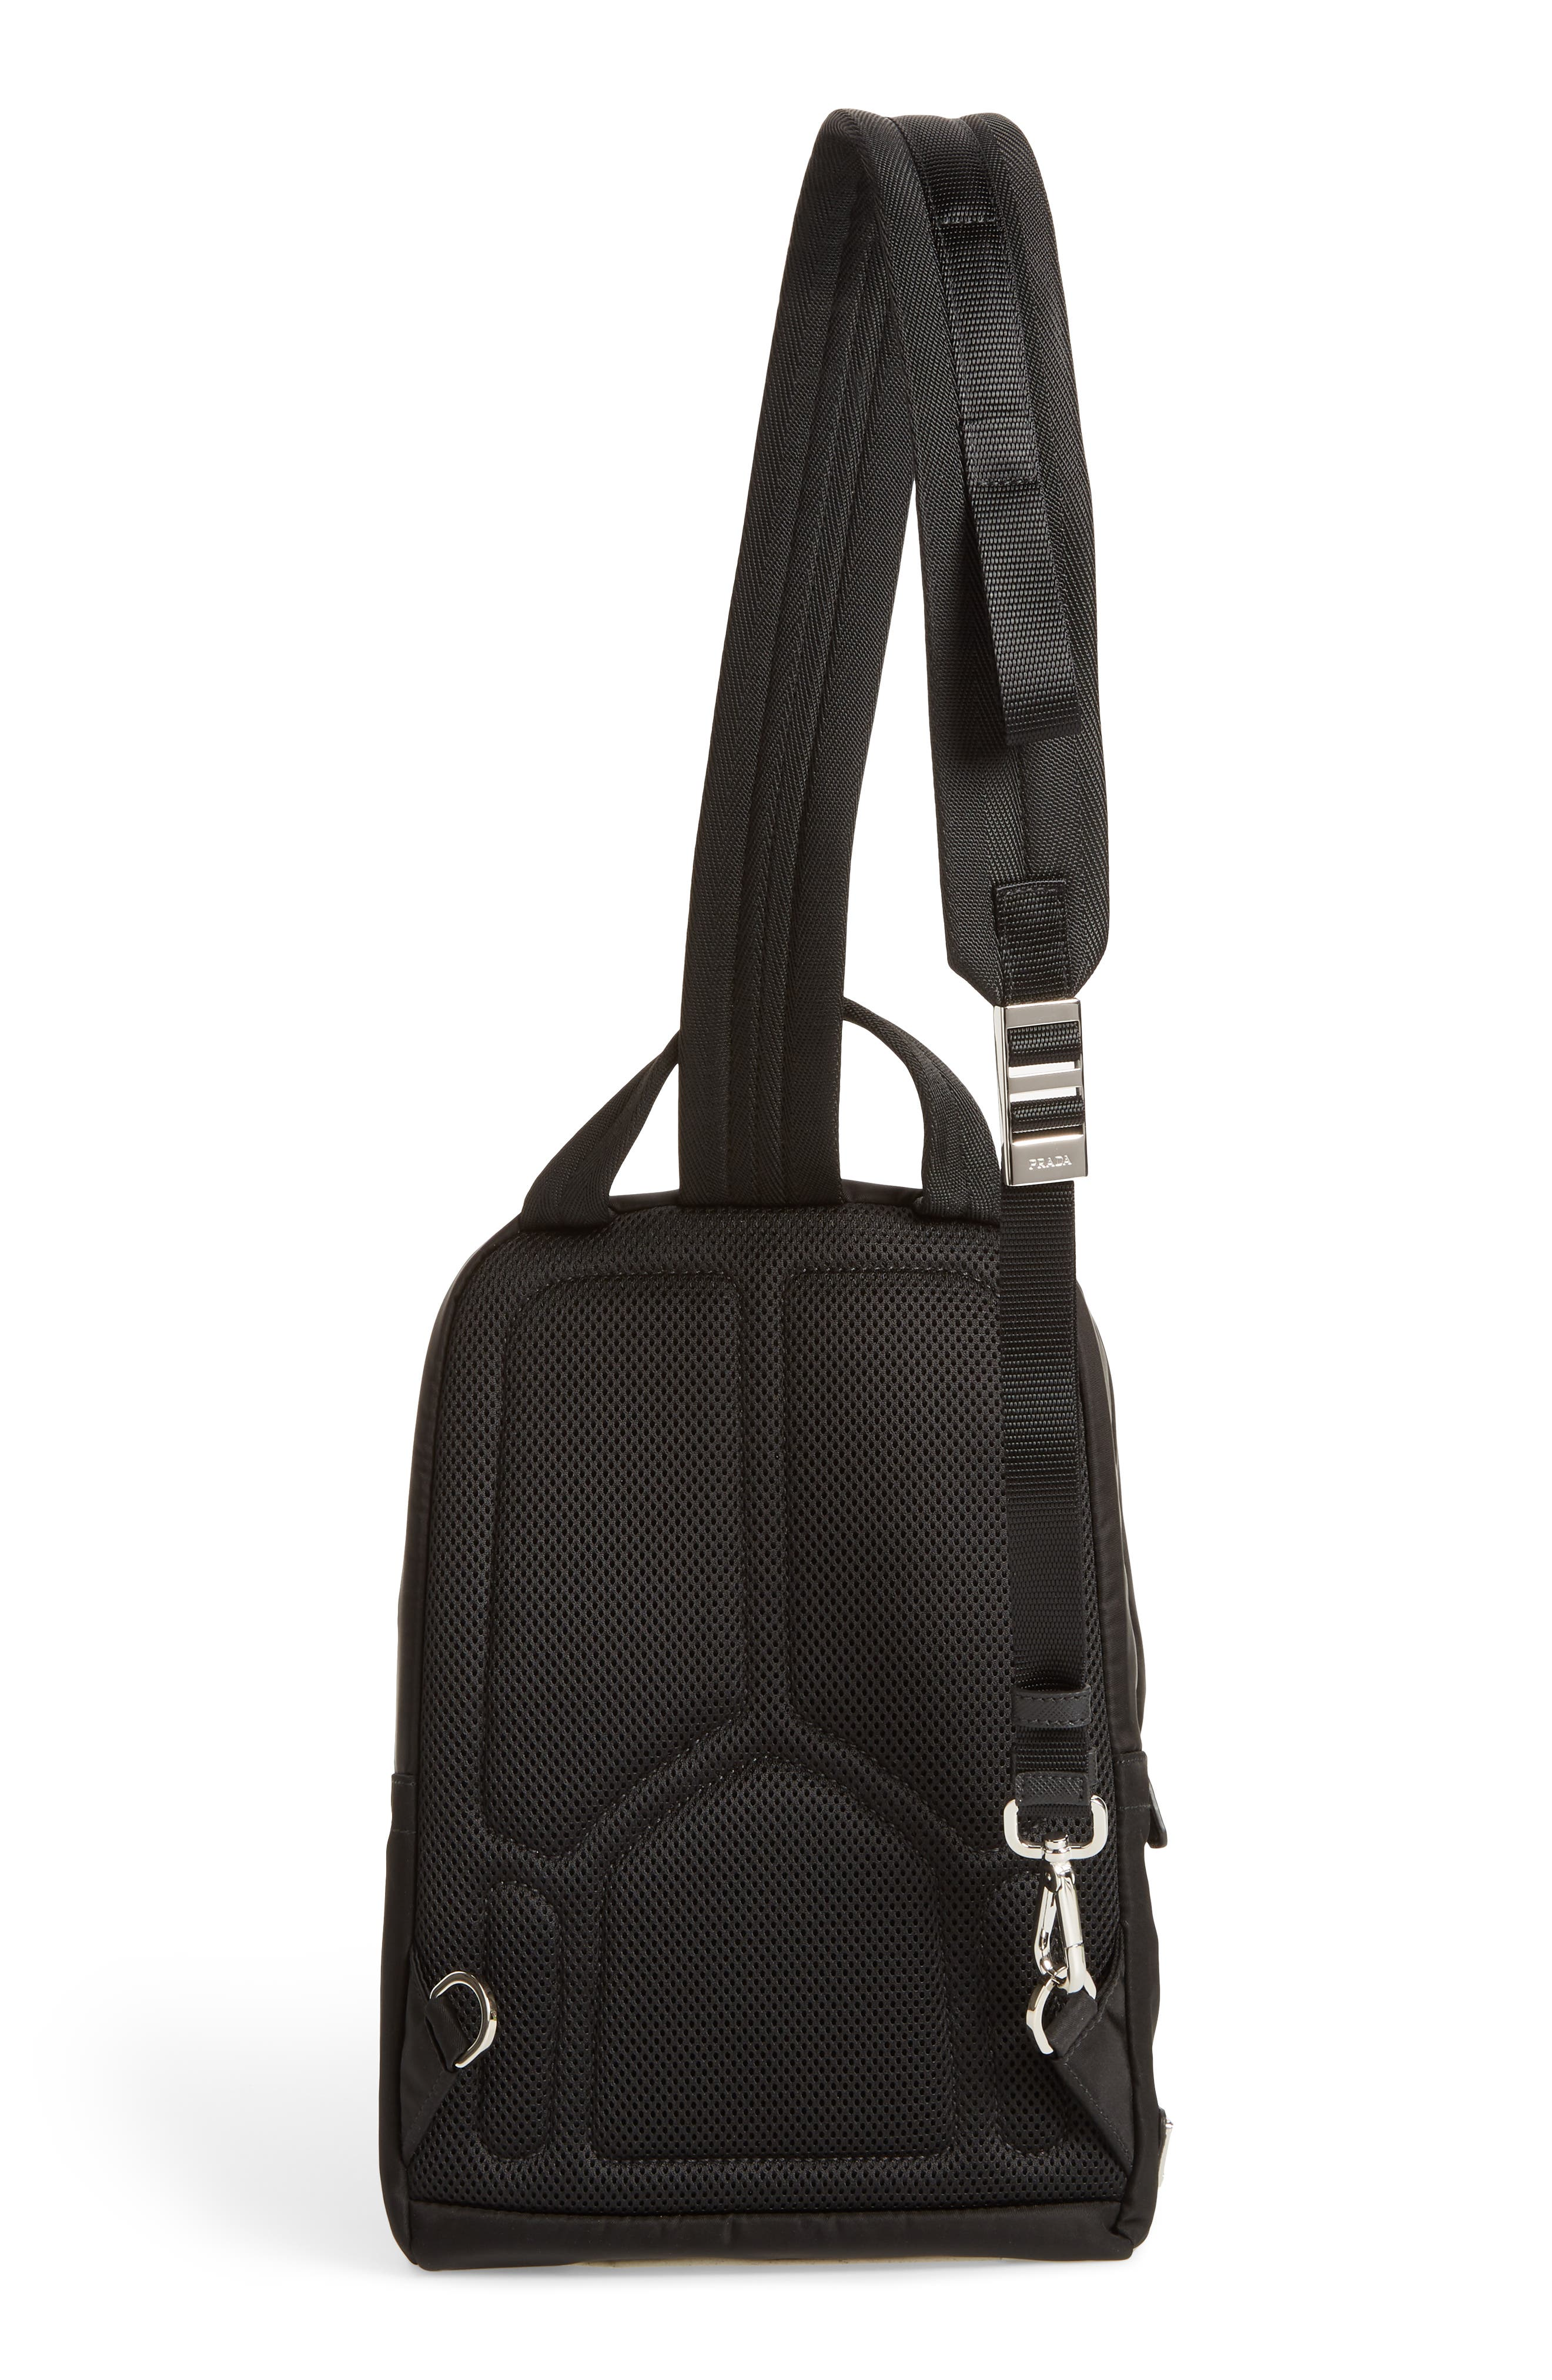 PRADA,                             Tessuto Small Sling Bag,                             Alternate thumbnail 3, color,                             001